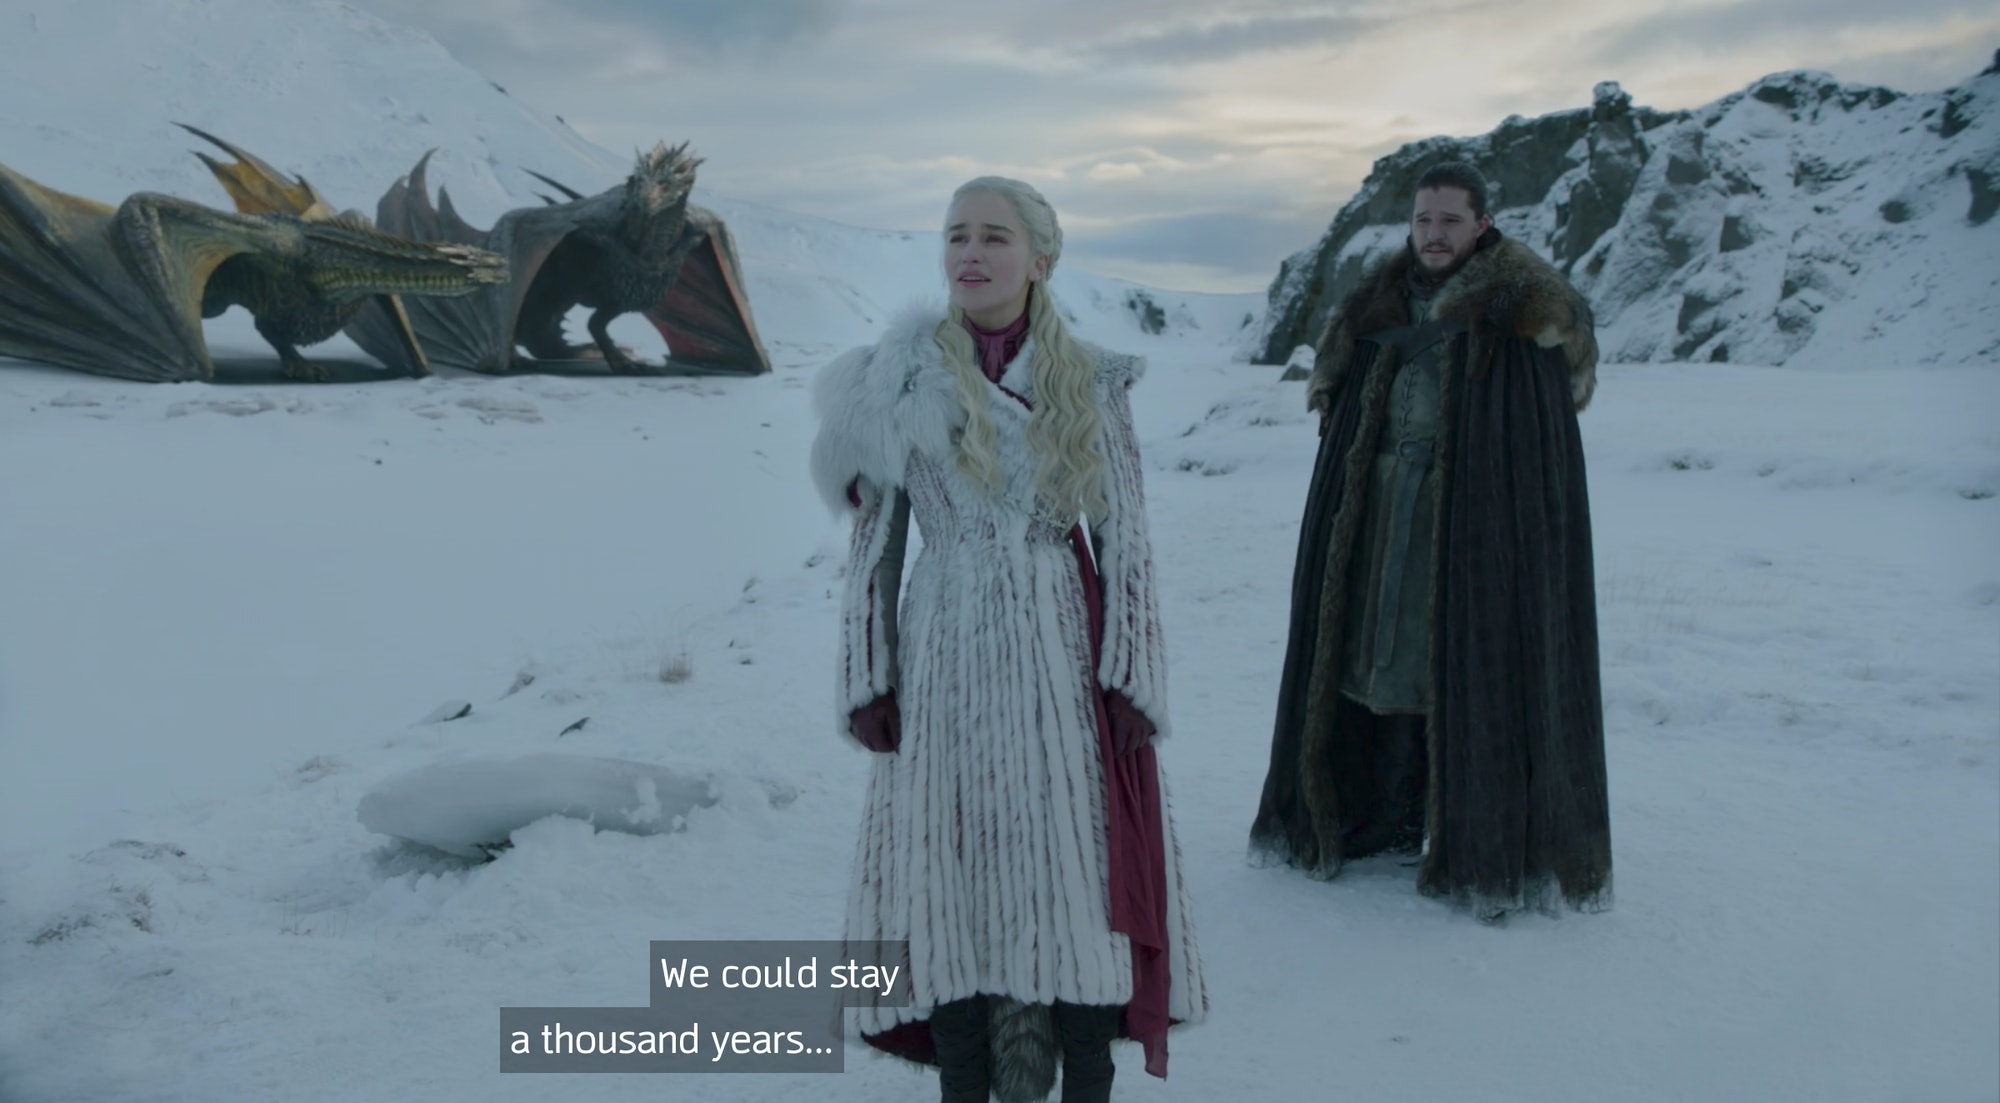 Emilia Clarke and Kit Harington in 'Game of Thrones' Season 8